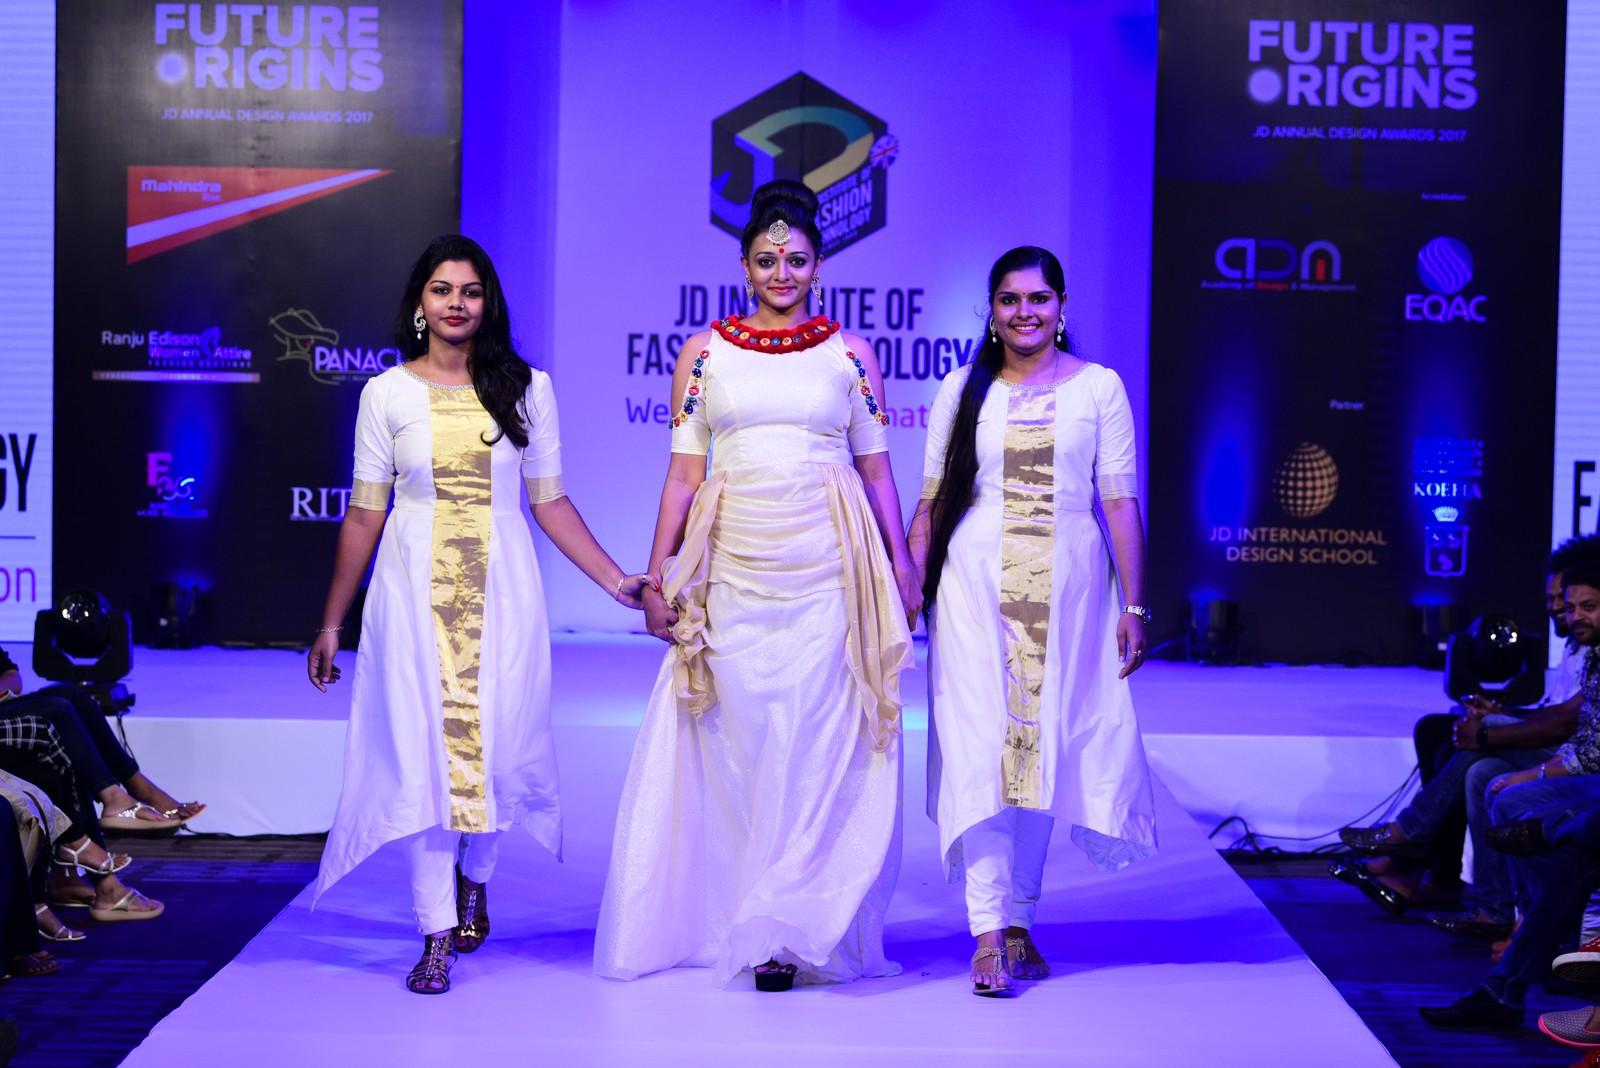 Aartha Parambrya – Future Origin – JD Annual Design Awards 2017 - Cochin aartha parambrya - Aartha Parambrya     Future Origin     JD Annual Design Awards 2017 Cochin 12 - Aartha Parambrya – Future Origin – JD Annual Design Awards 2017